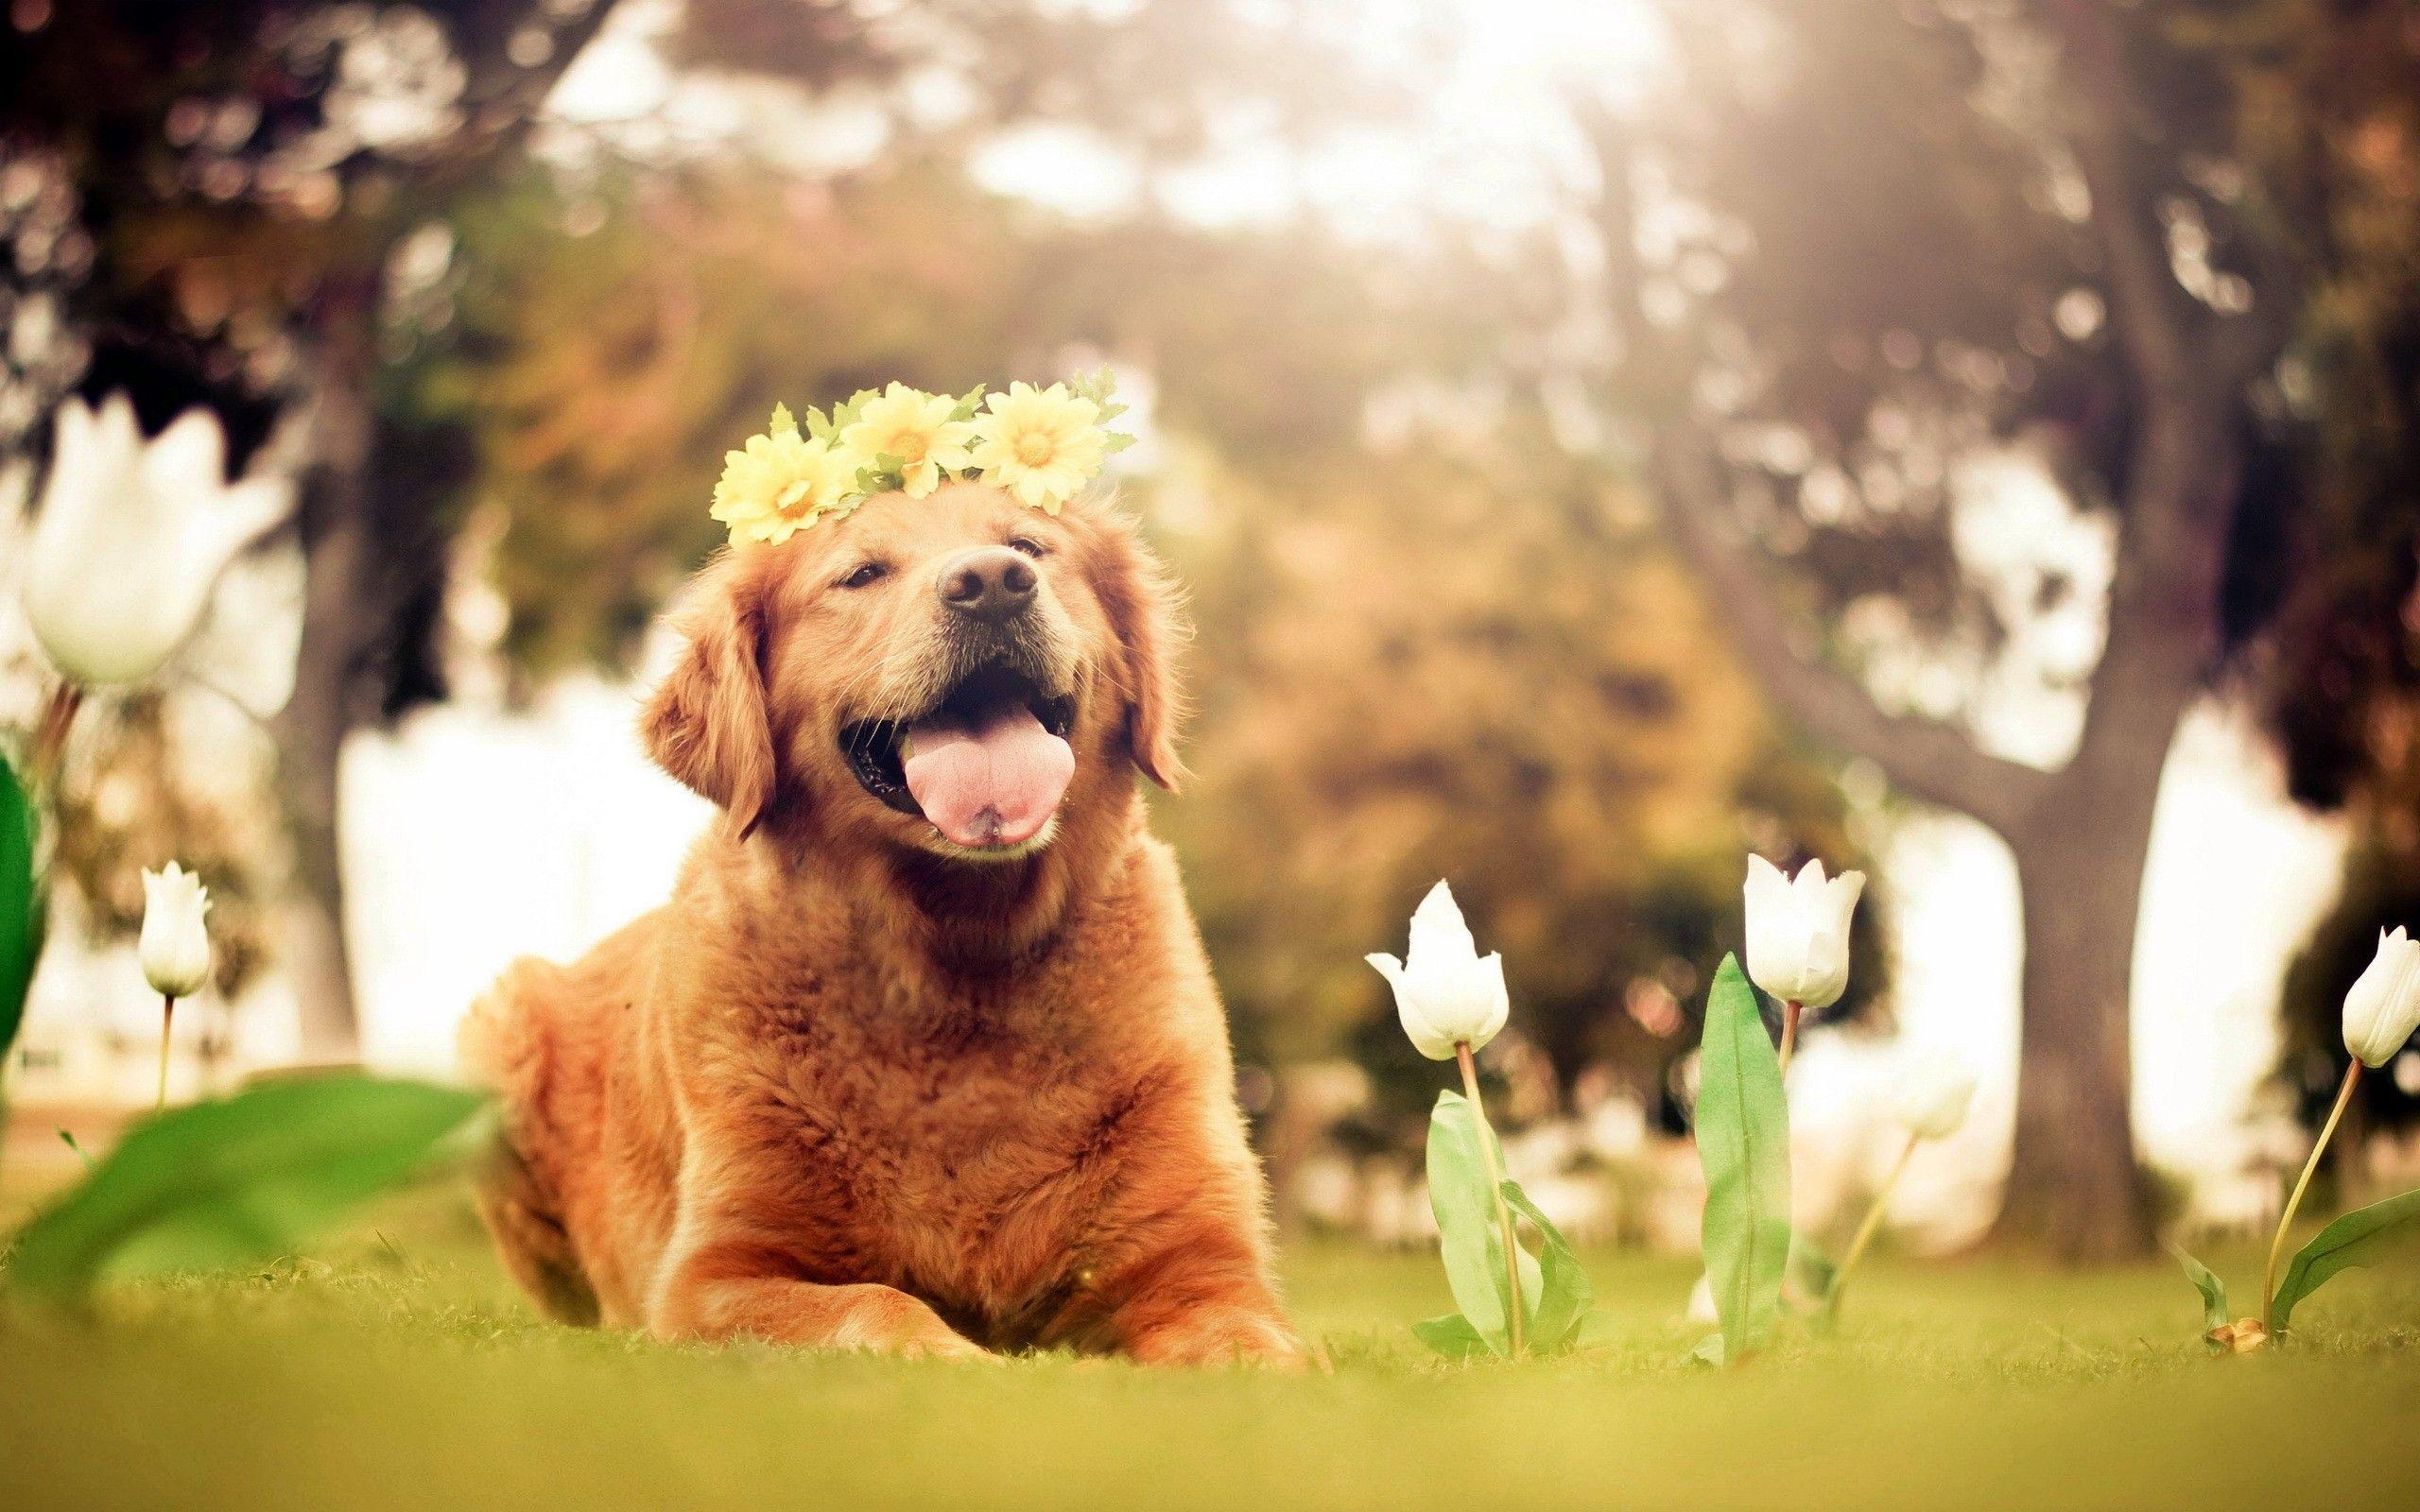 Springtime Dog Wallpapers   Top Springtime Dog Backgrounds 2560x1600